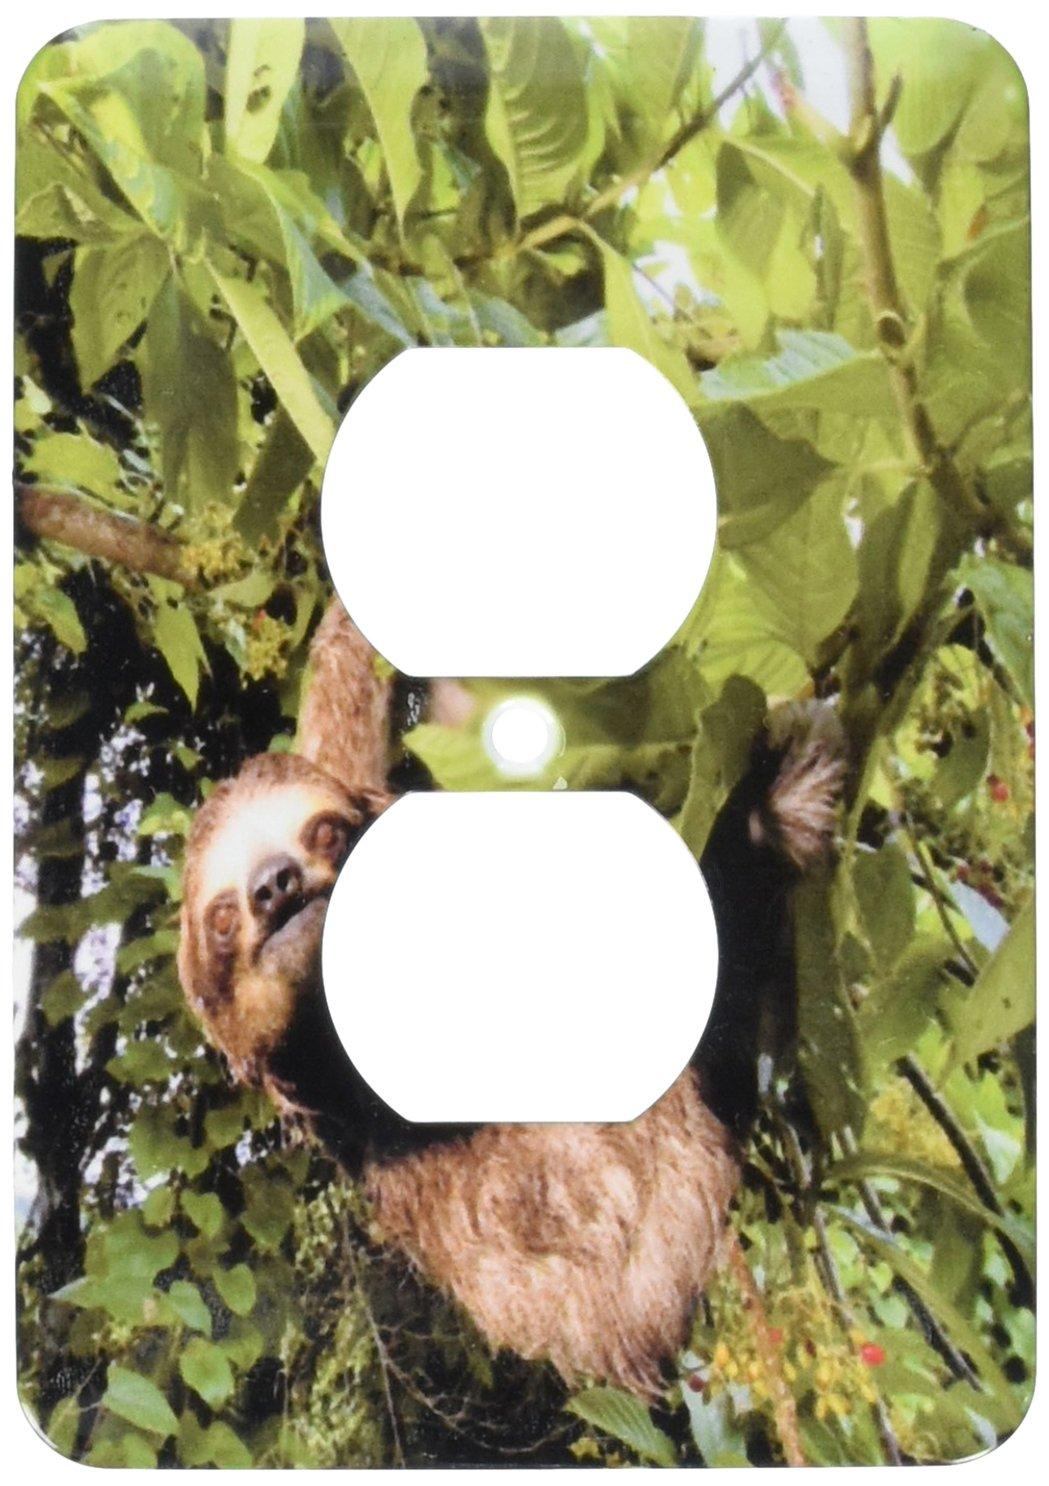 3dRose lsp_86913_6 Panama, Panama City, Three-Toed Sloth Wildlife Sa15 Czi0561 Christian Ziegler 2 Plug Outlet Cover